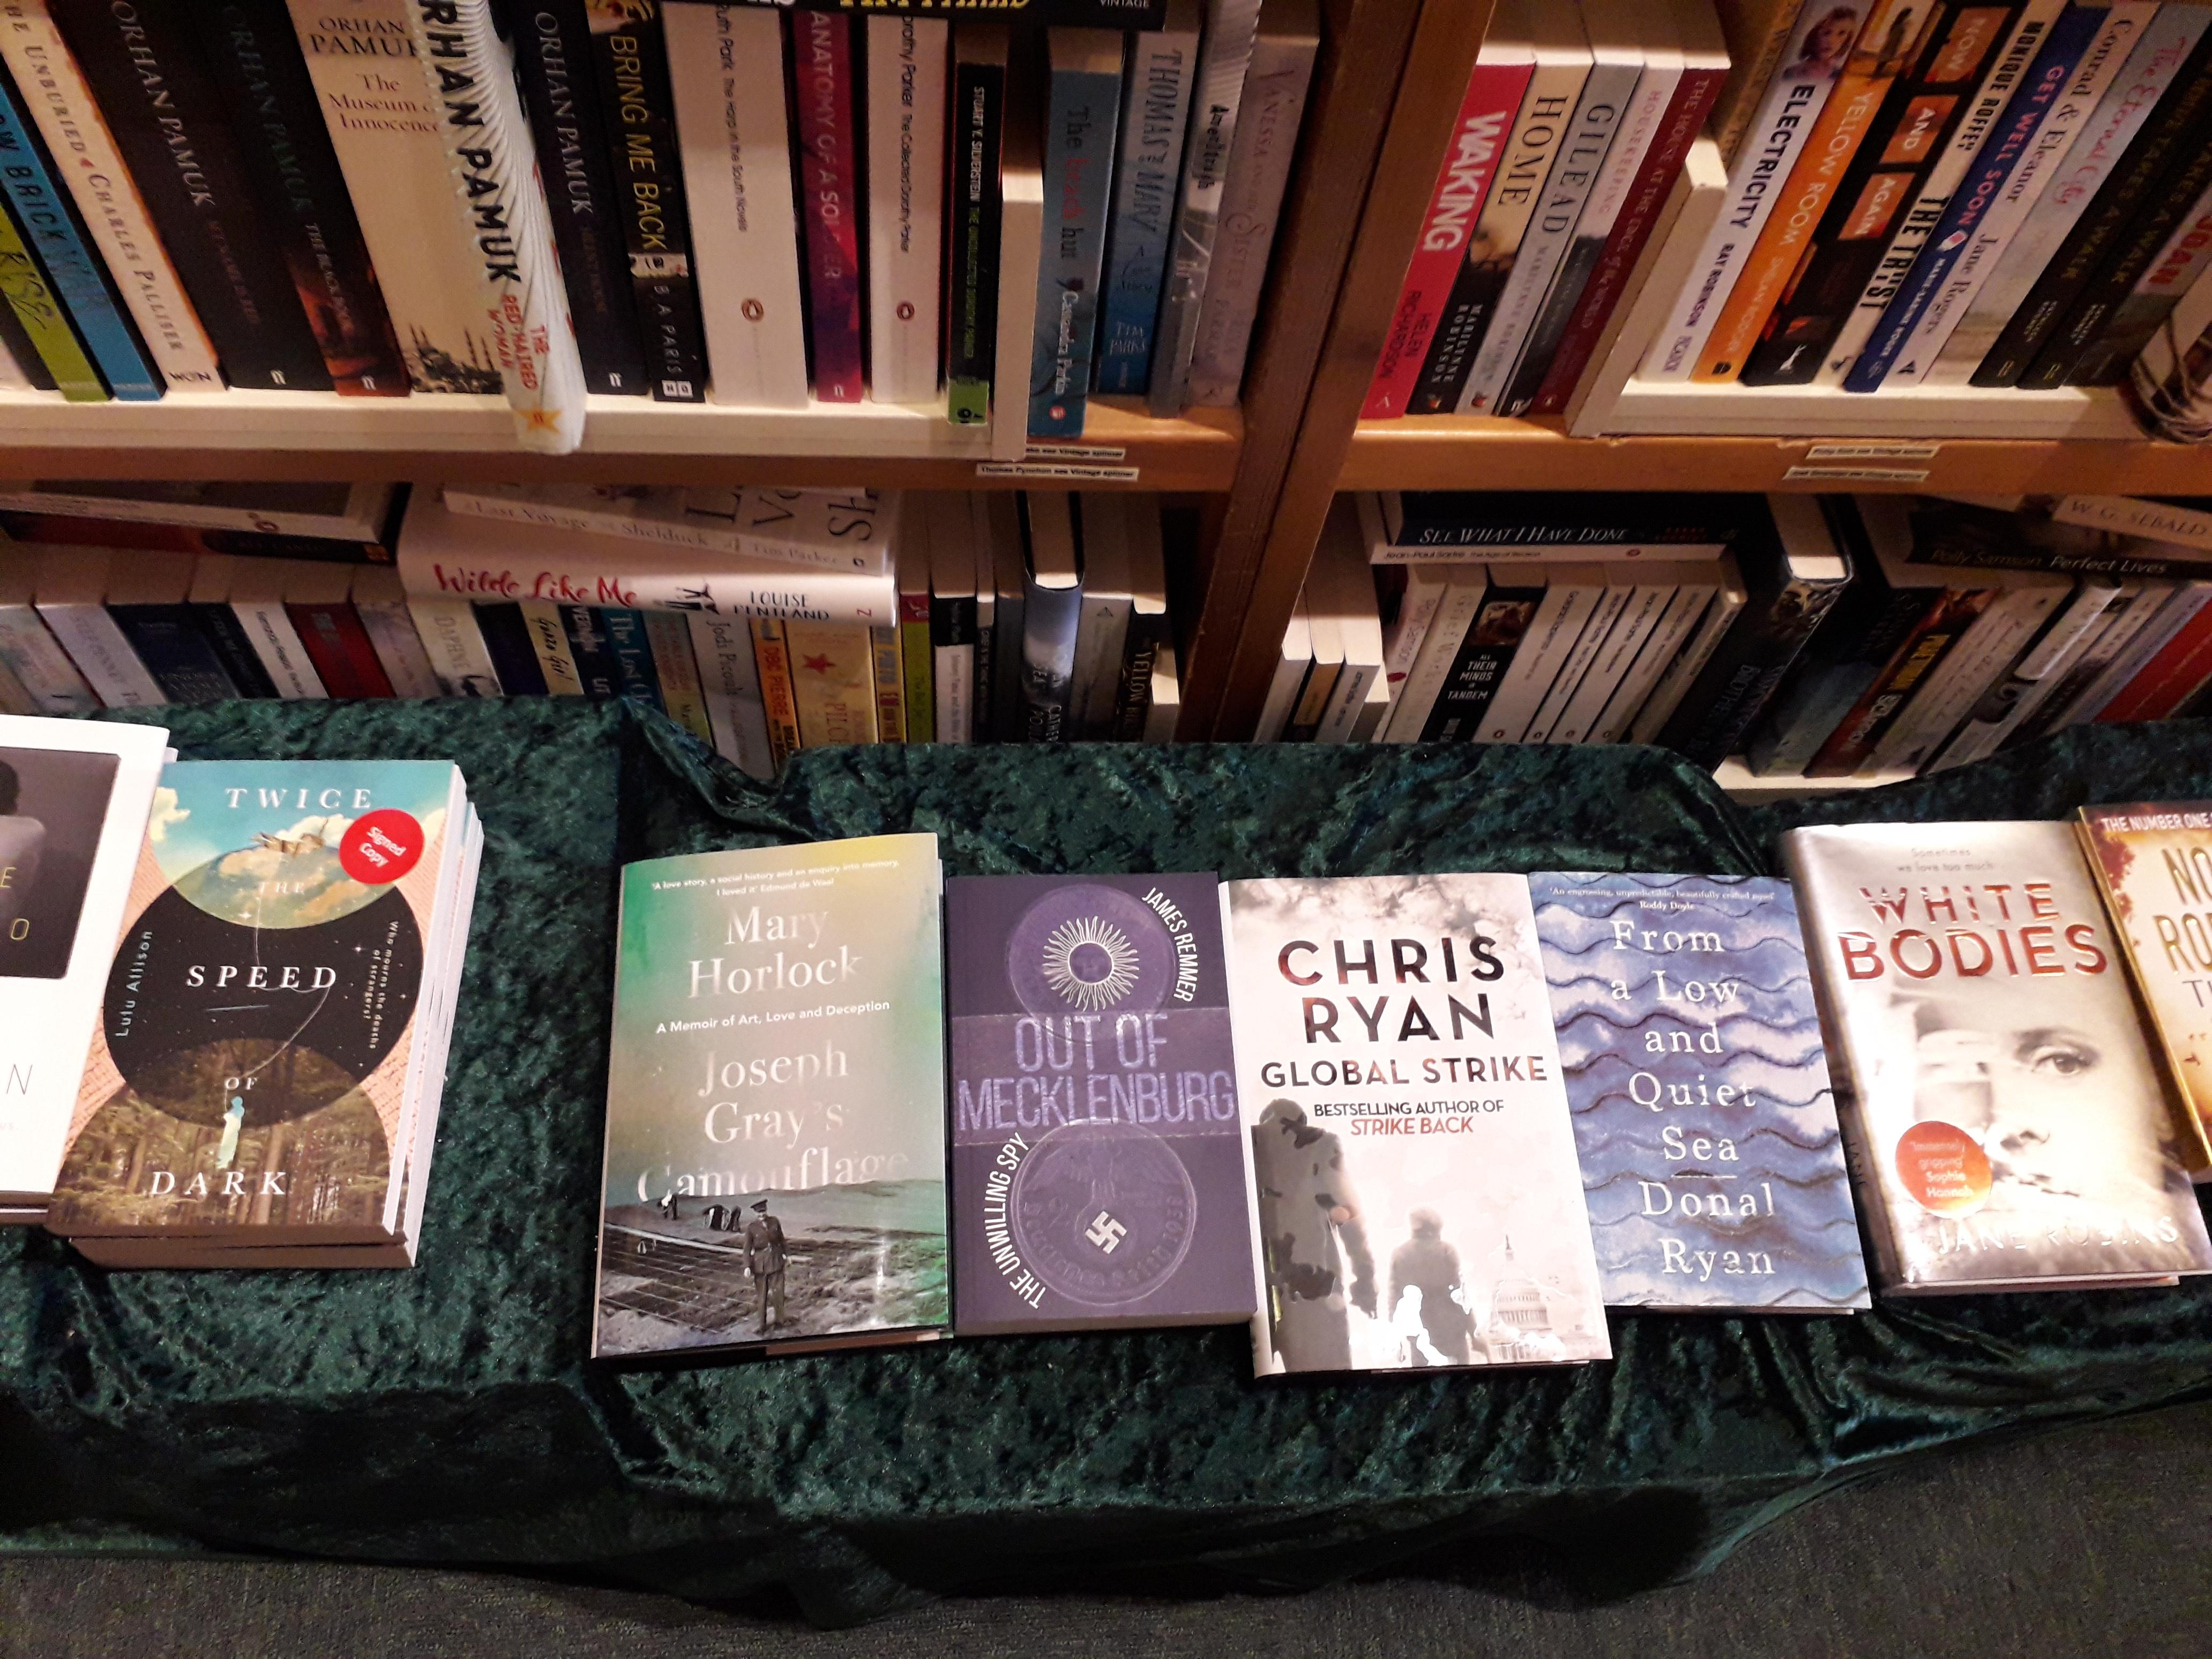 Out of Mecklenburg spy novel at City Books Hove